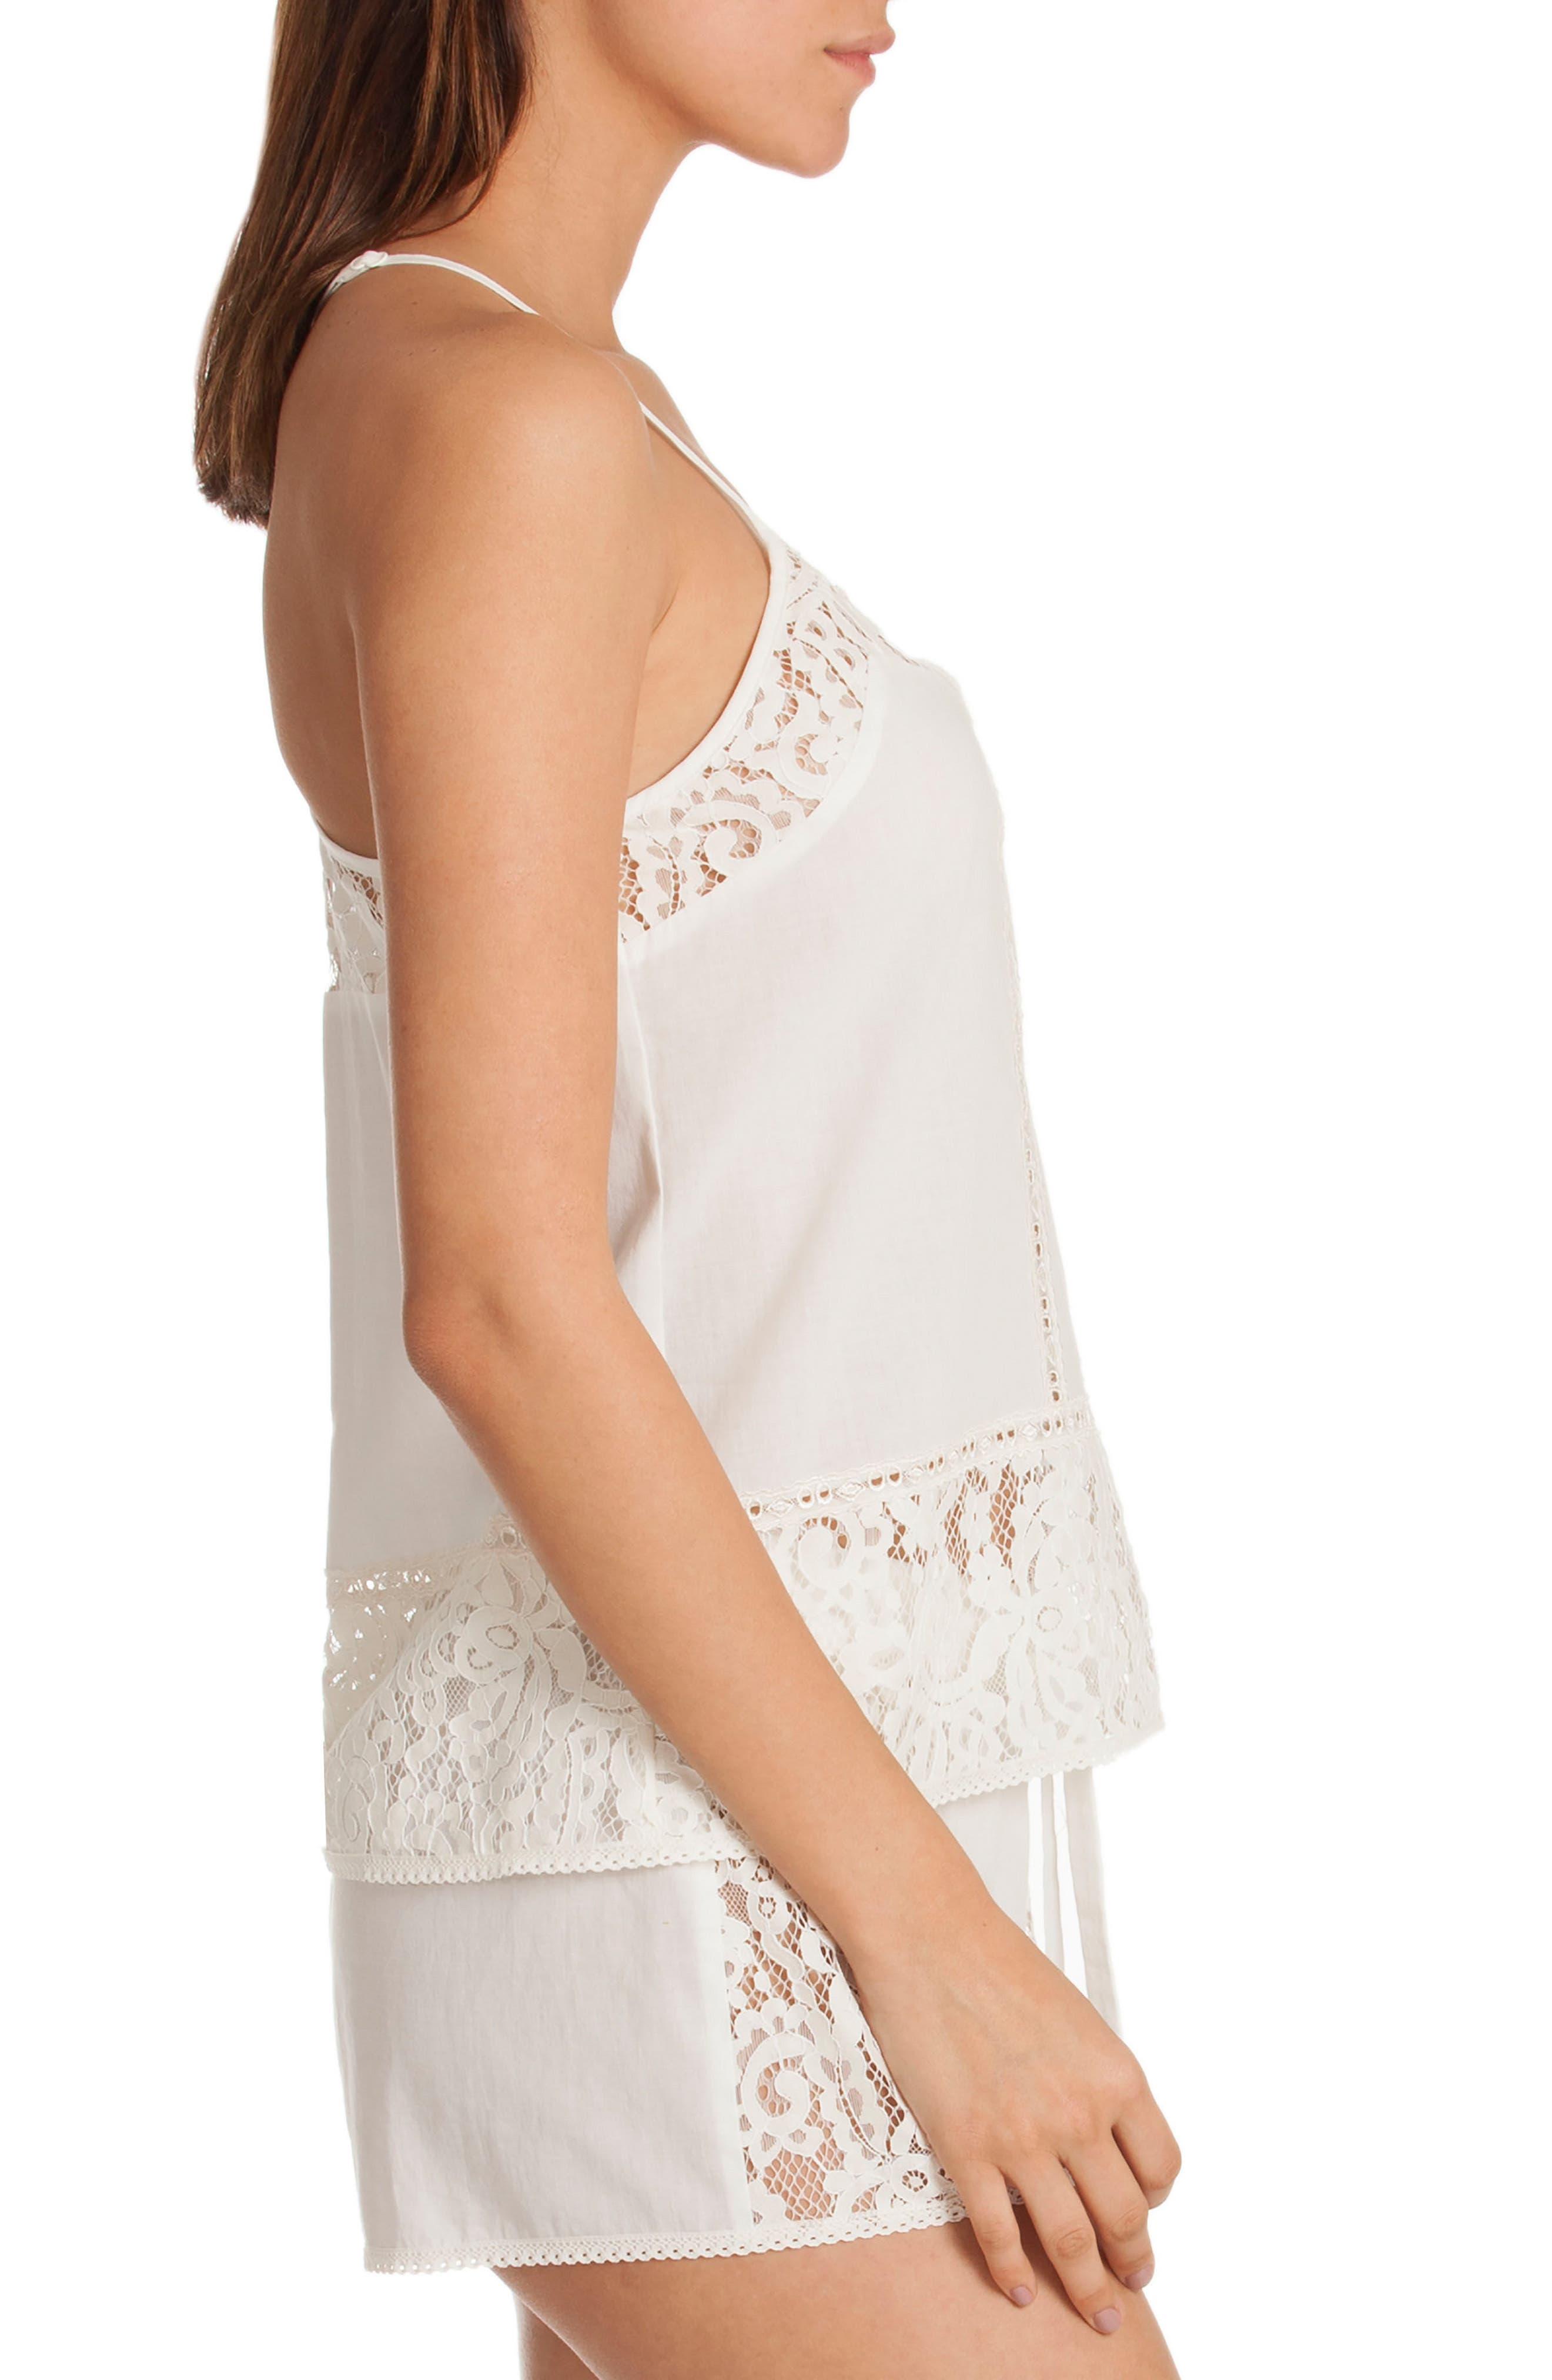 Eyelet Cotton Short Pajamas,                             Alternate thumbnail 3, color,                             Ivory/ Beige